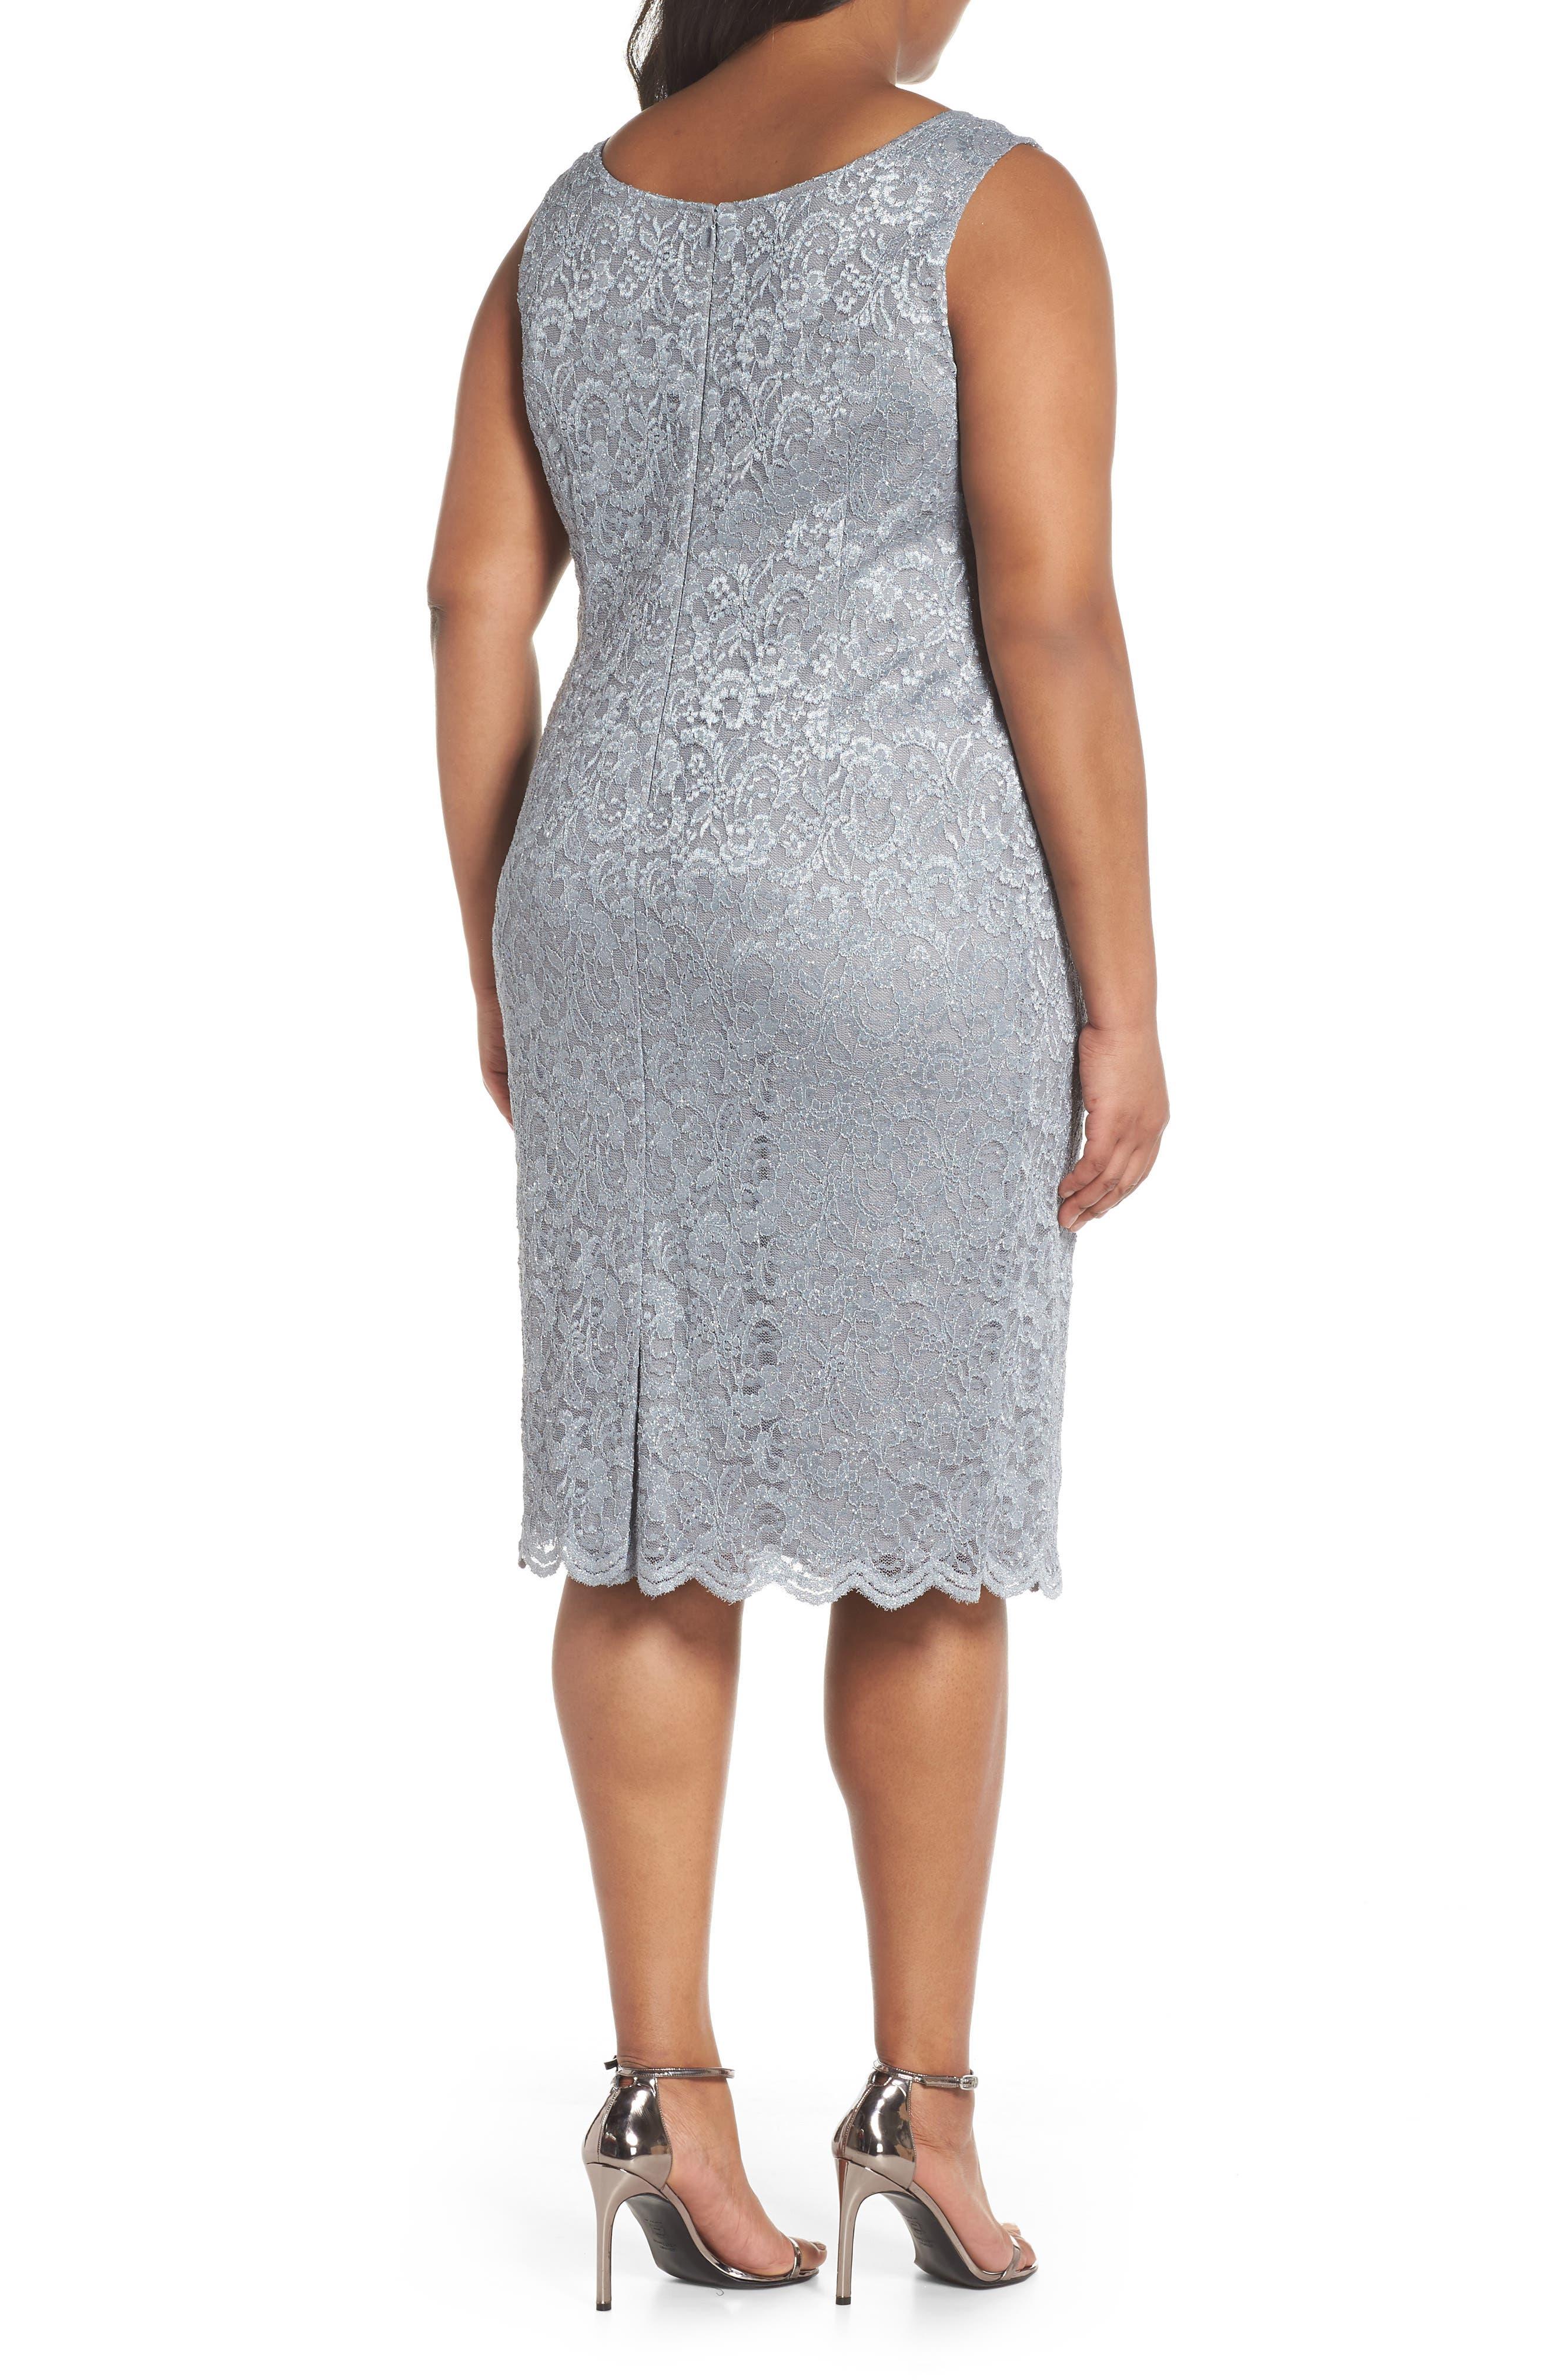 ALEX EVENINGS,                             Lace Sheath Dress with Bolero Jacket,                             Alternate thumbnail 4, color,                             040